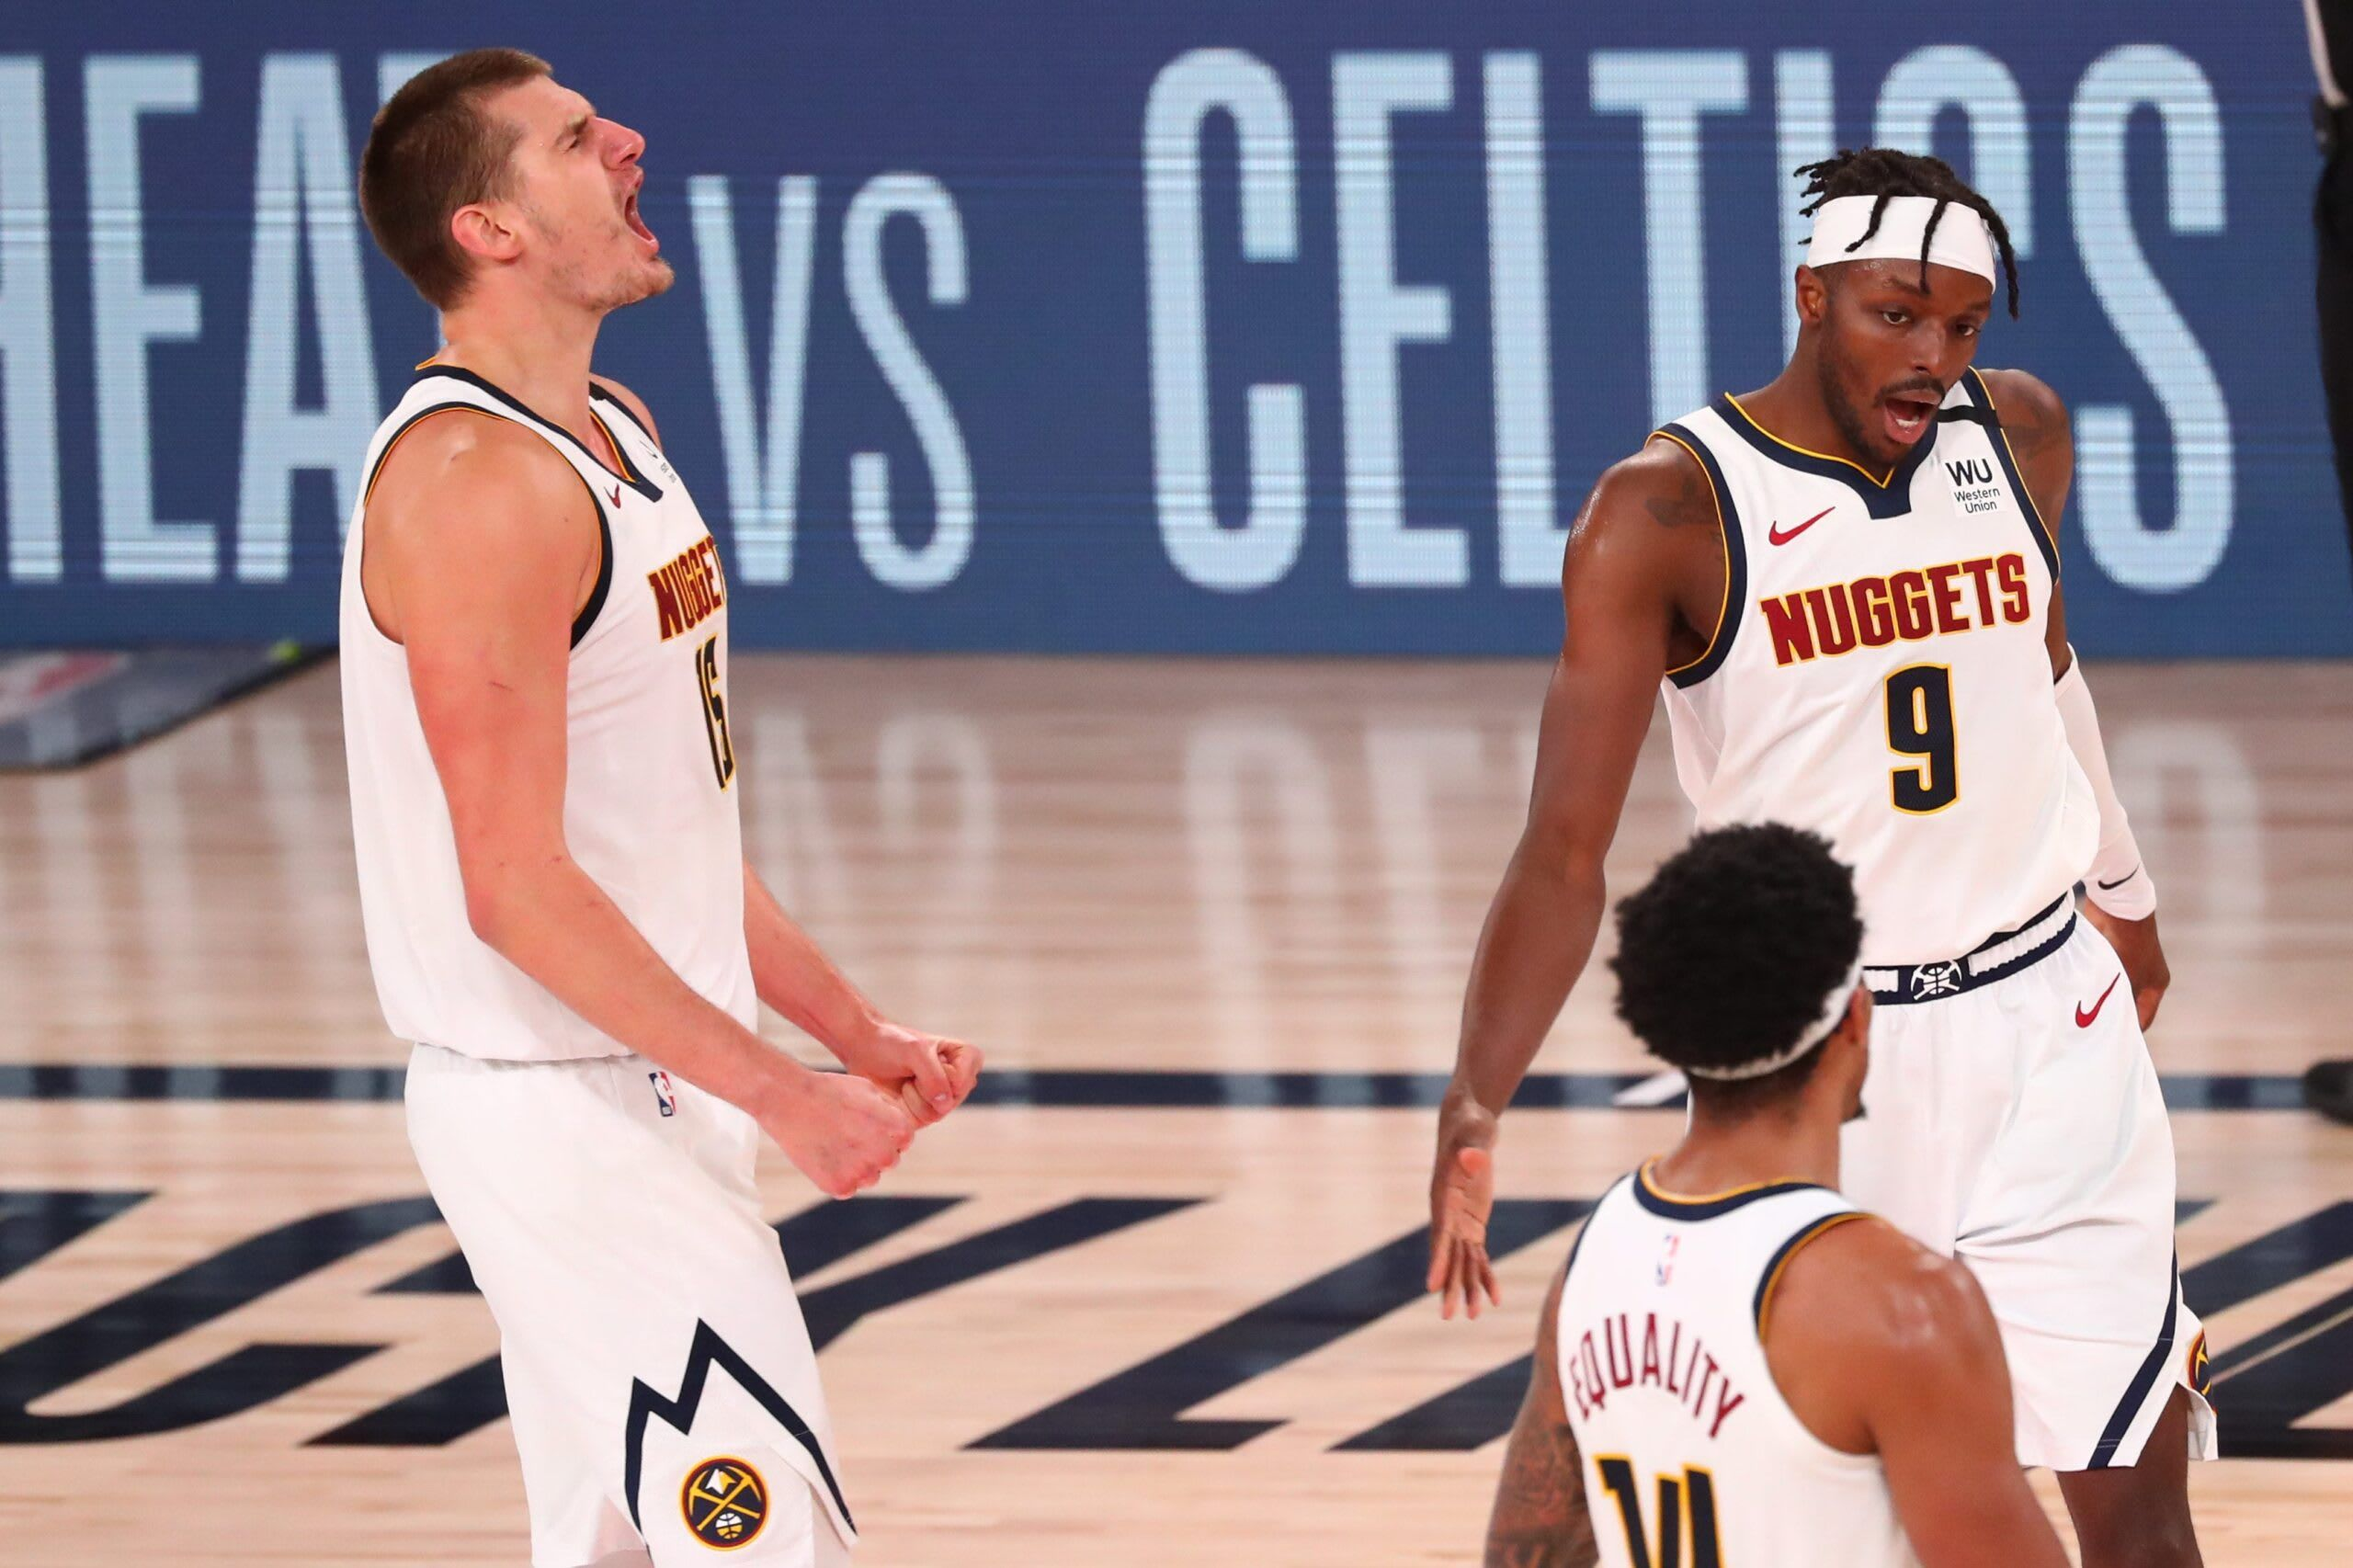 Denver Nuggets Stun L A Clippers In Game 7 To Reach West Finals Jeff Zillgitt Usa Today Www Bit Ly P Spo Sports Sport Portal4s In 2020 Denver Nuggets Nba Stunning